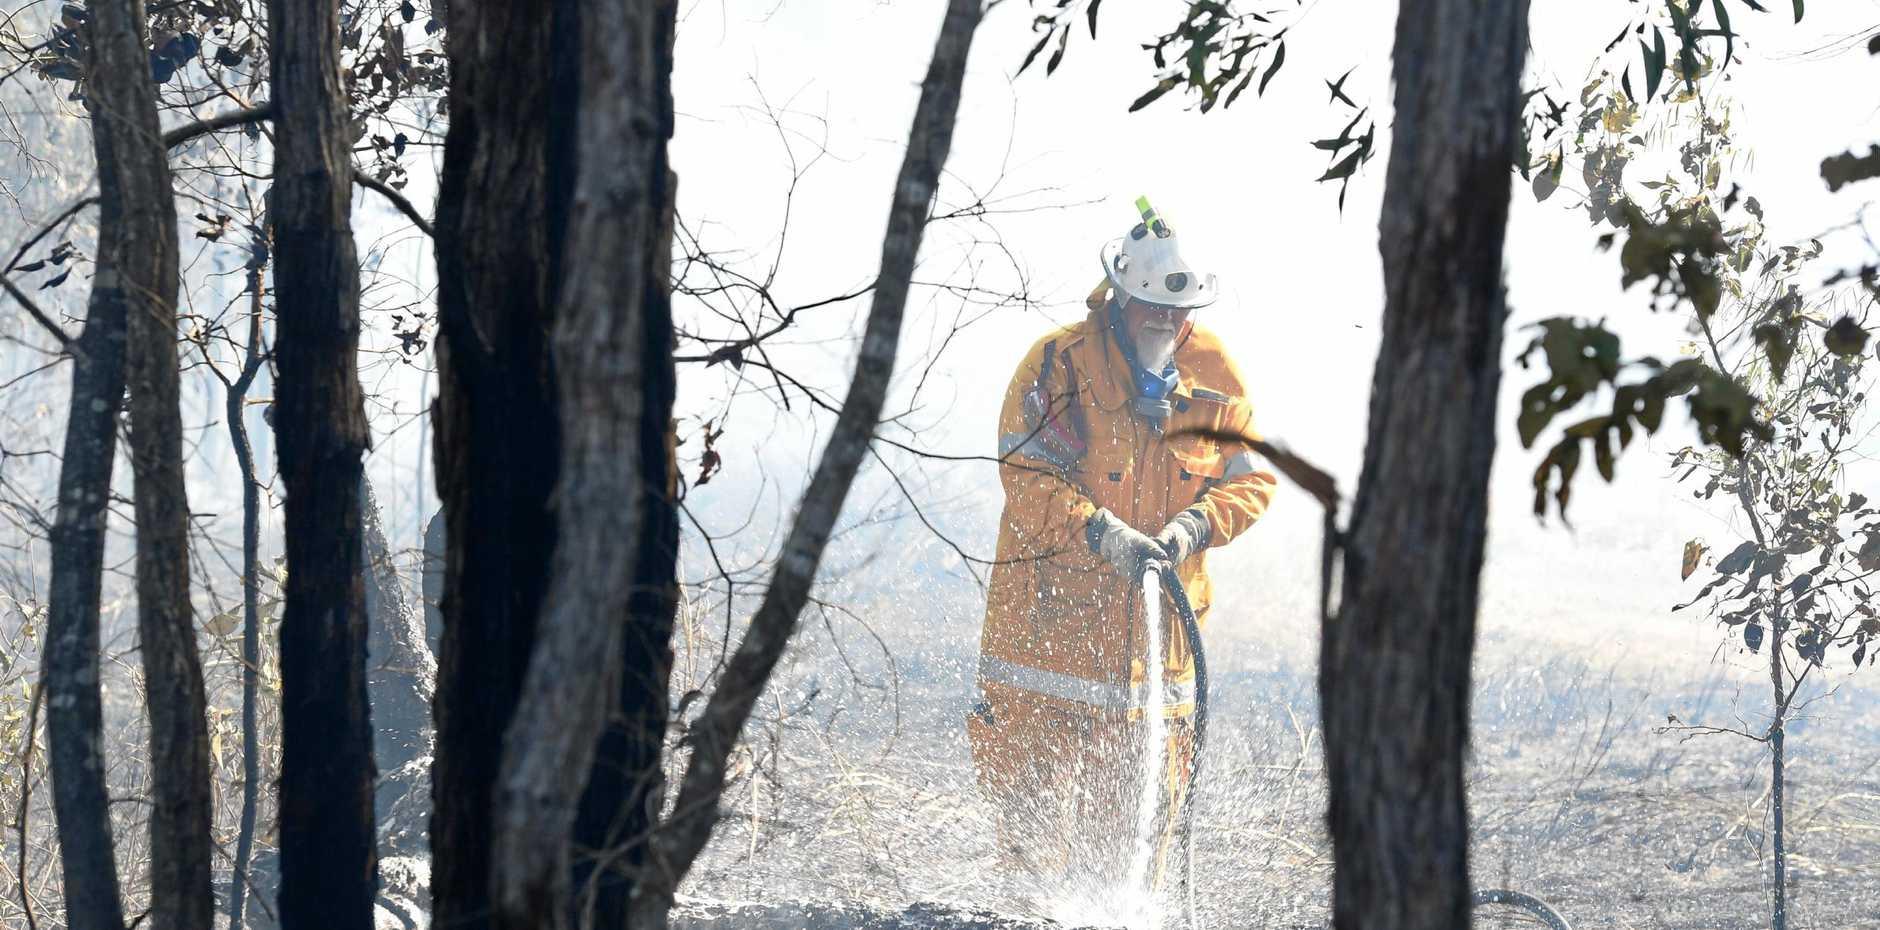 A bushfire is still burning at Cherwell.